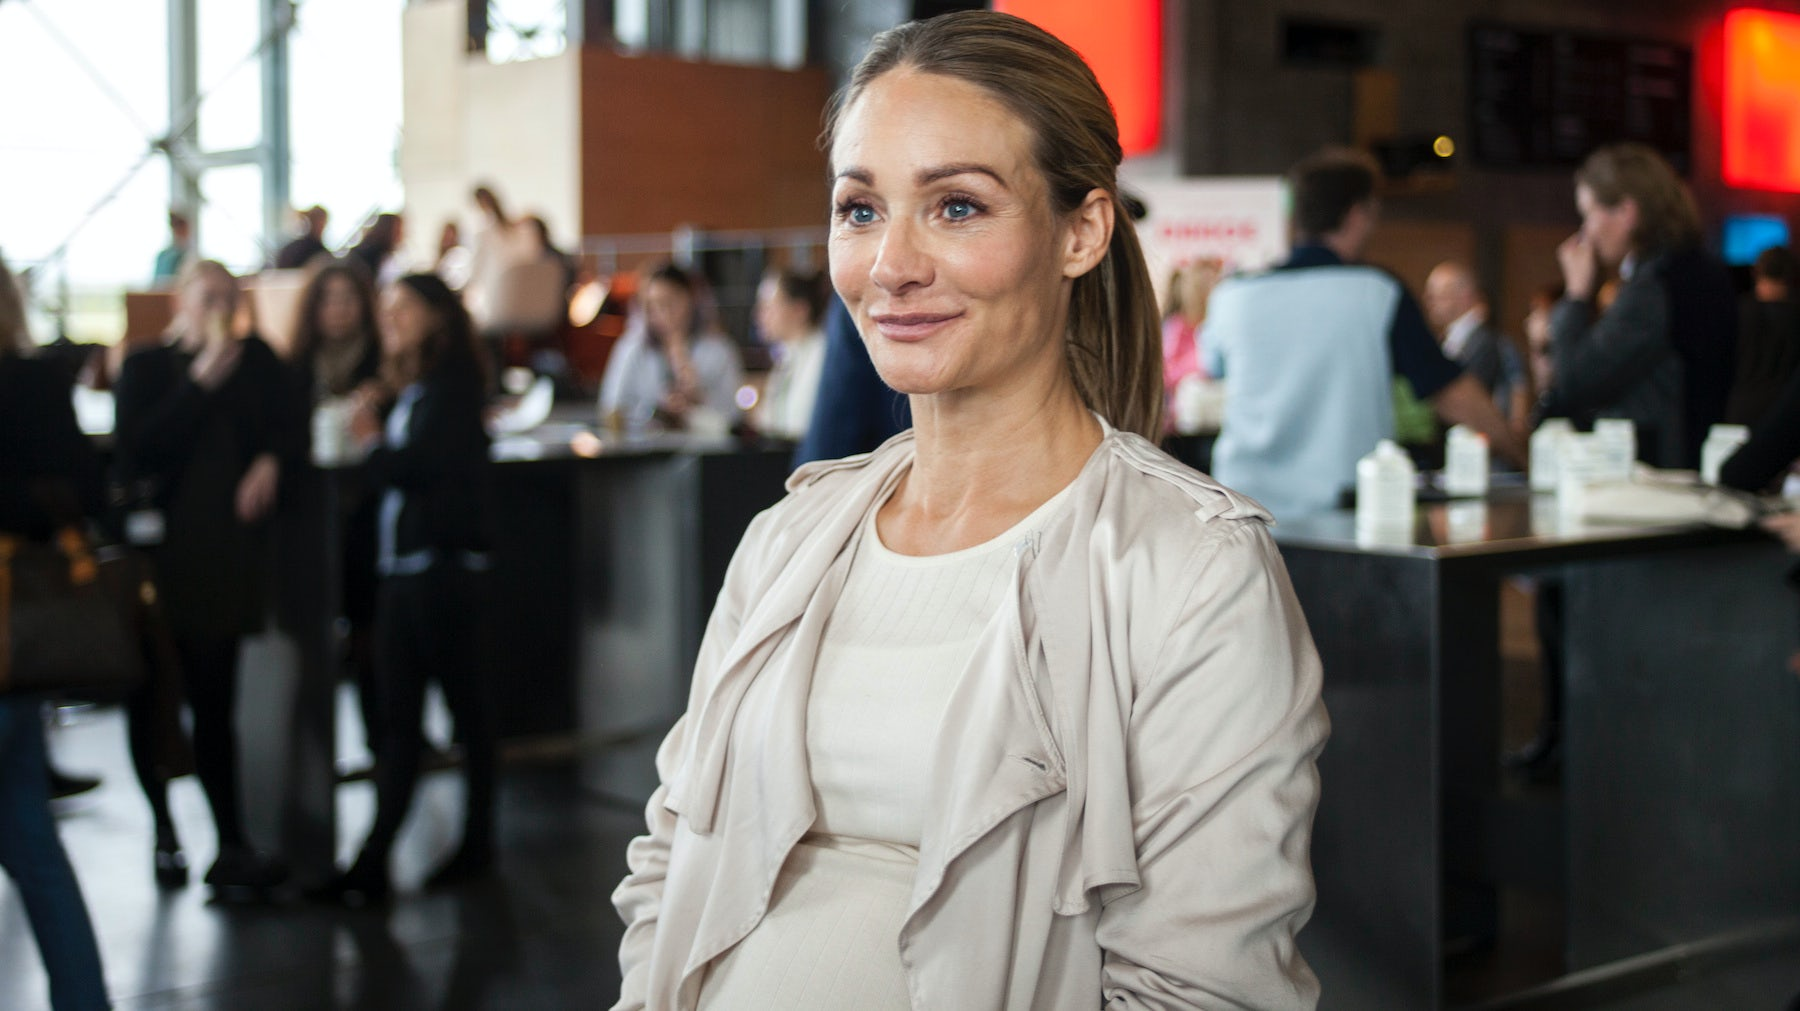 Copenhagen Fashion Summit founder Eva Kruse | Source: Copenhagen Fashion Summit